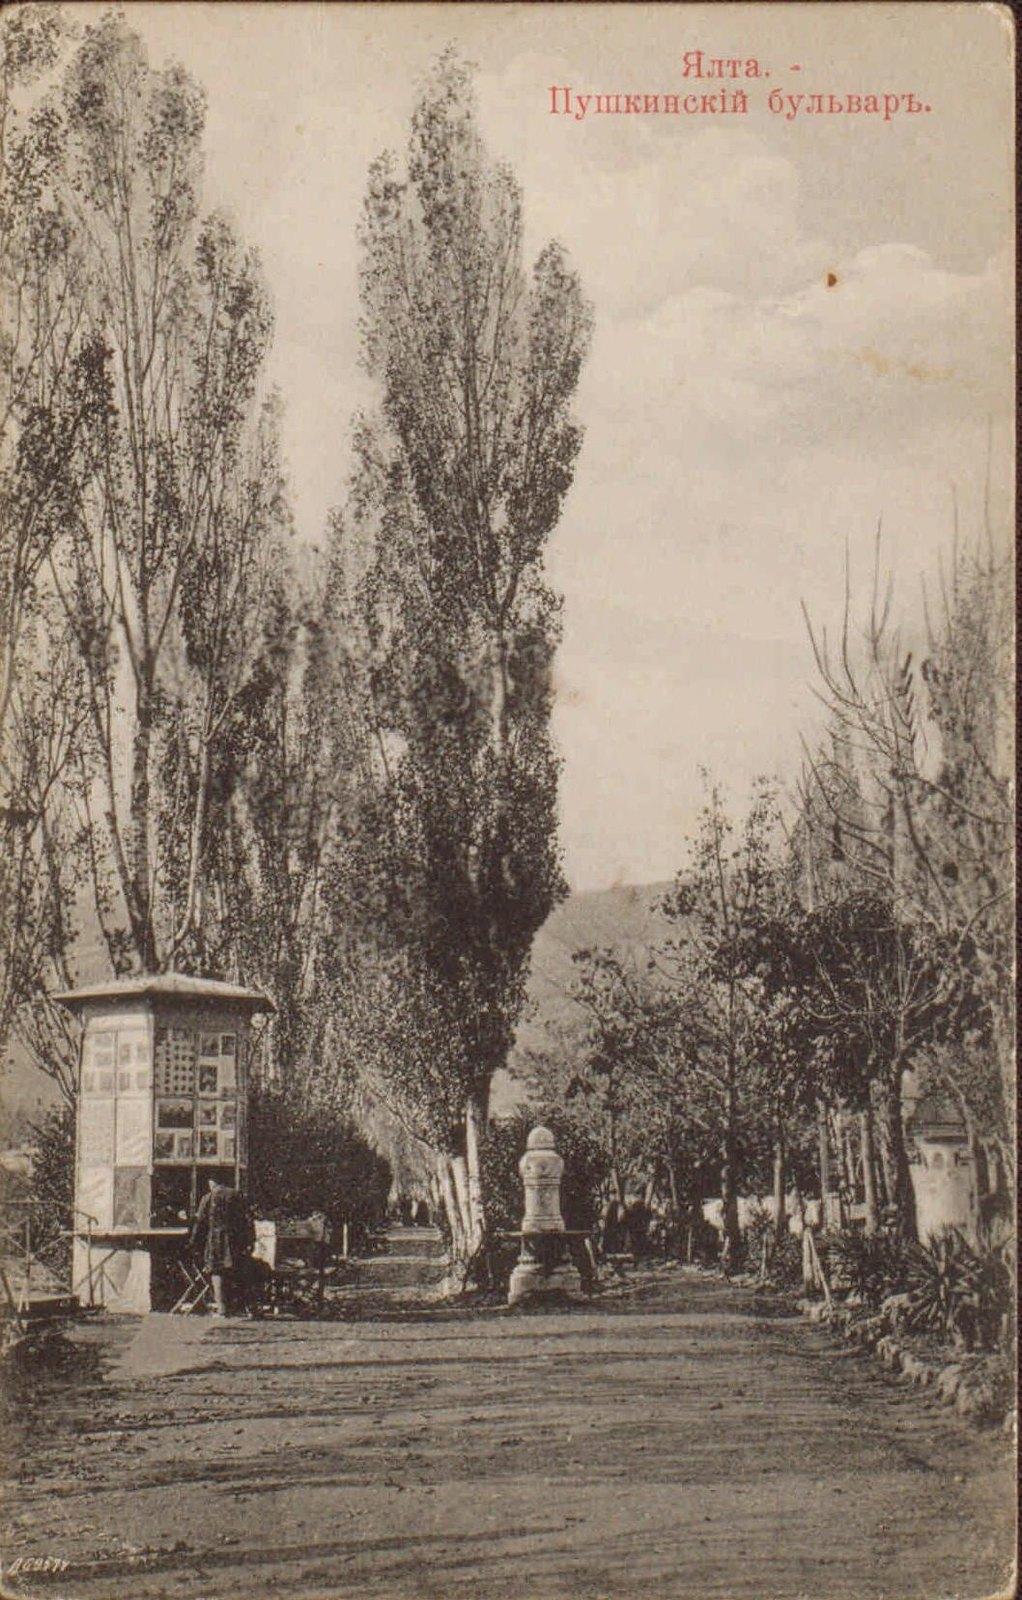 21. Пушкинский бульвар